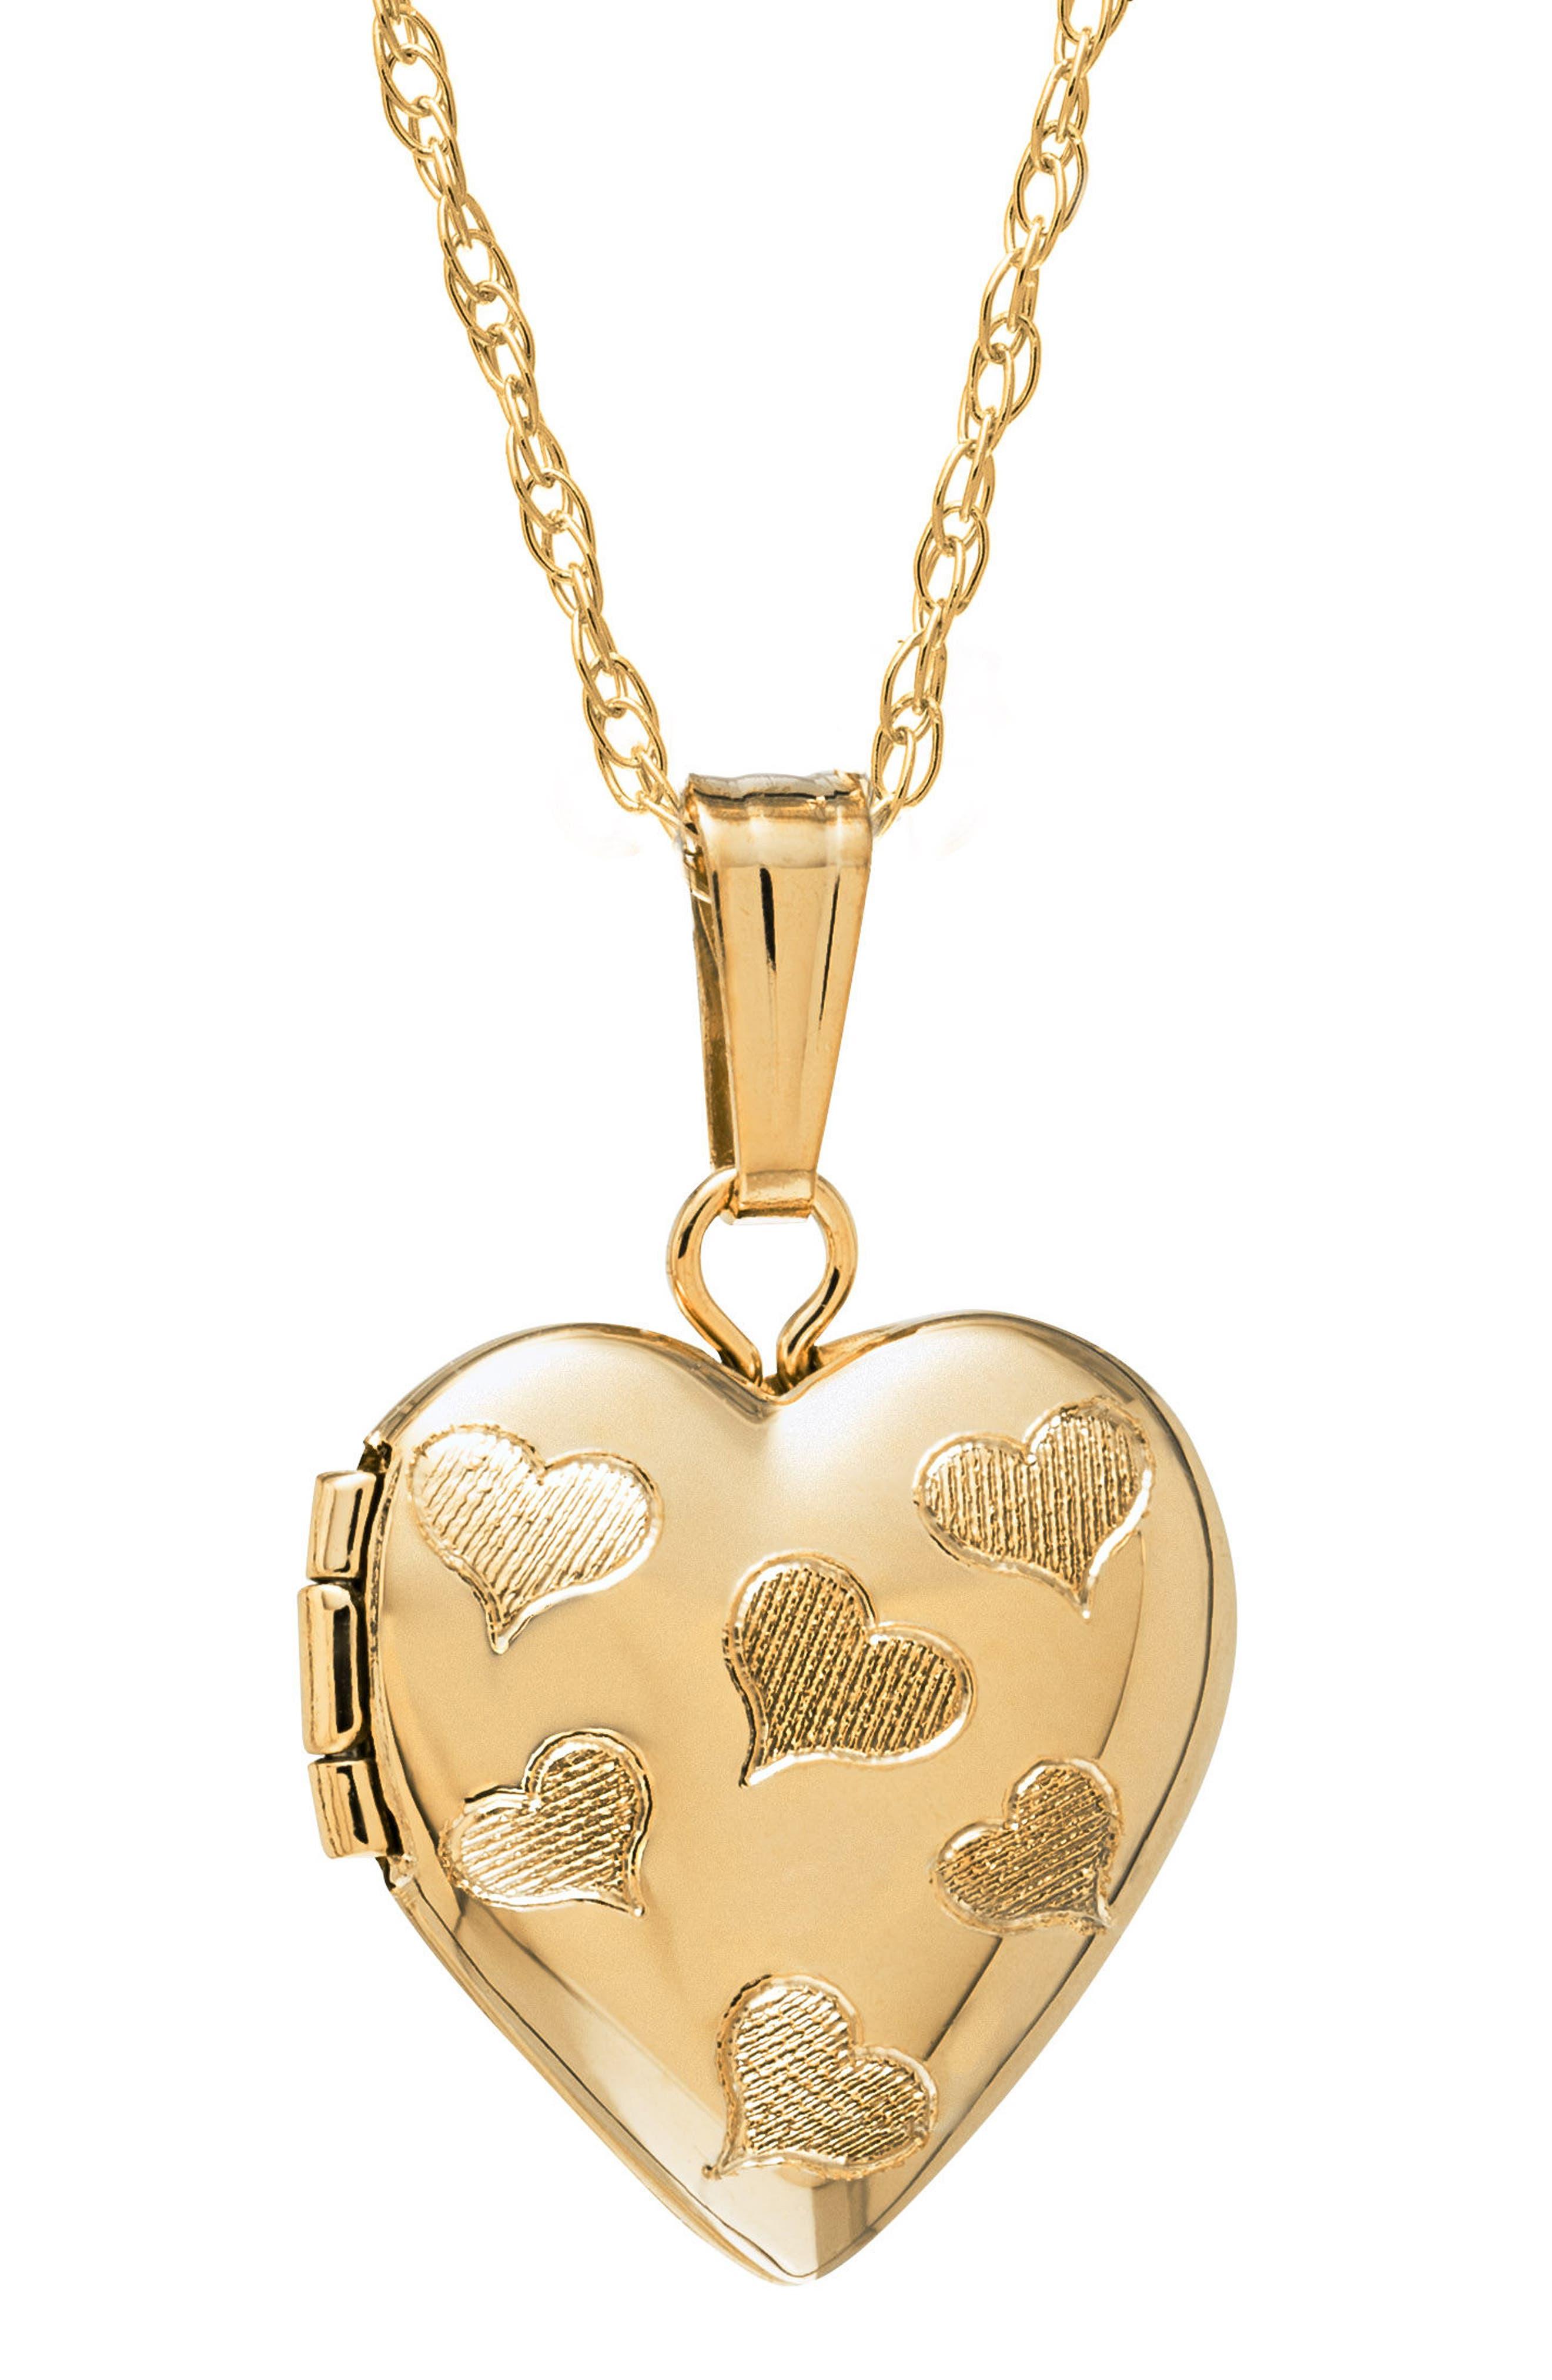 Girls Mignonette 14K Gold Heart Locket Necklace